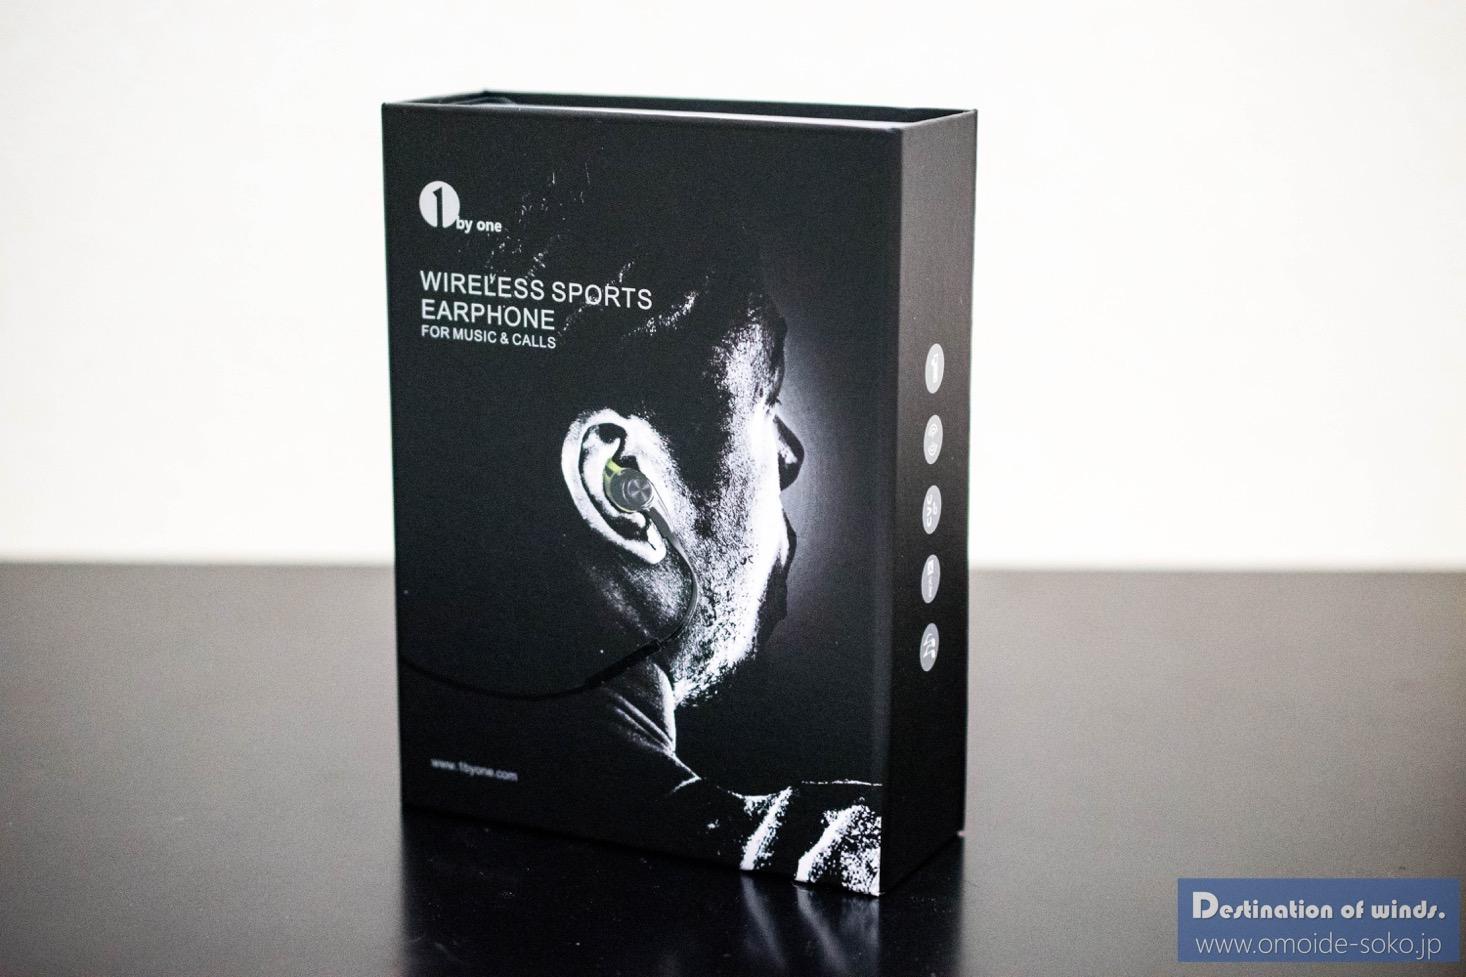 1byone_headset01